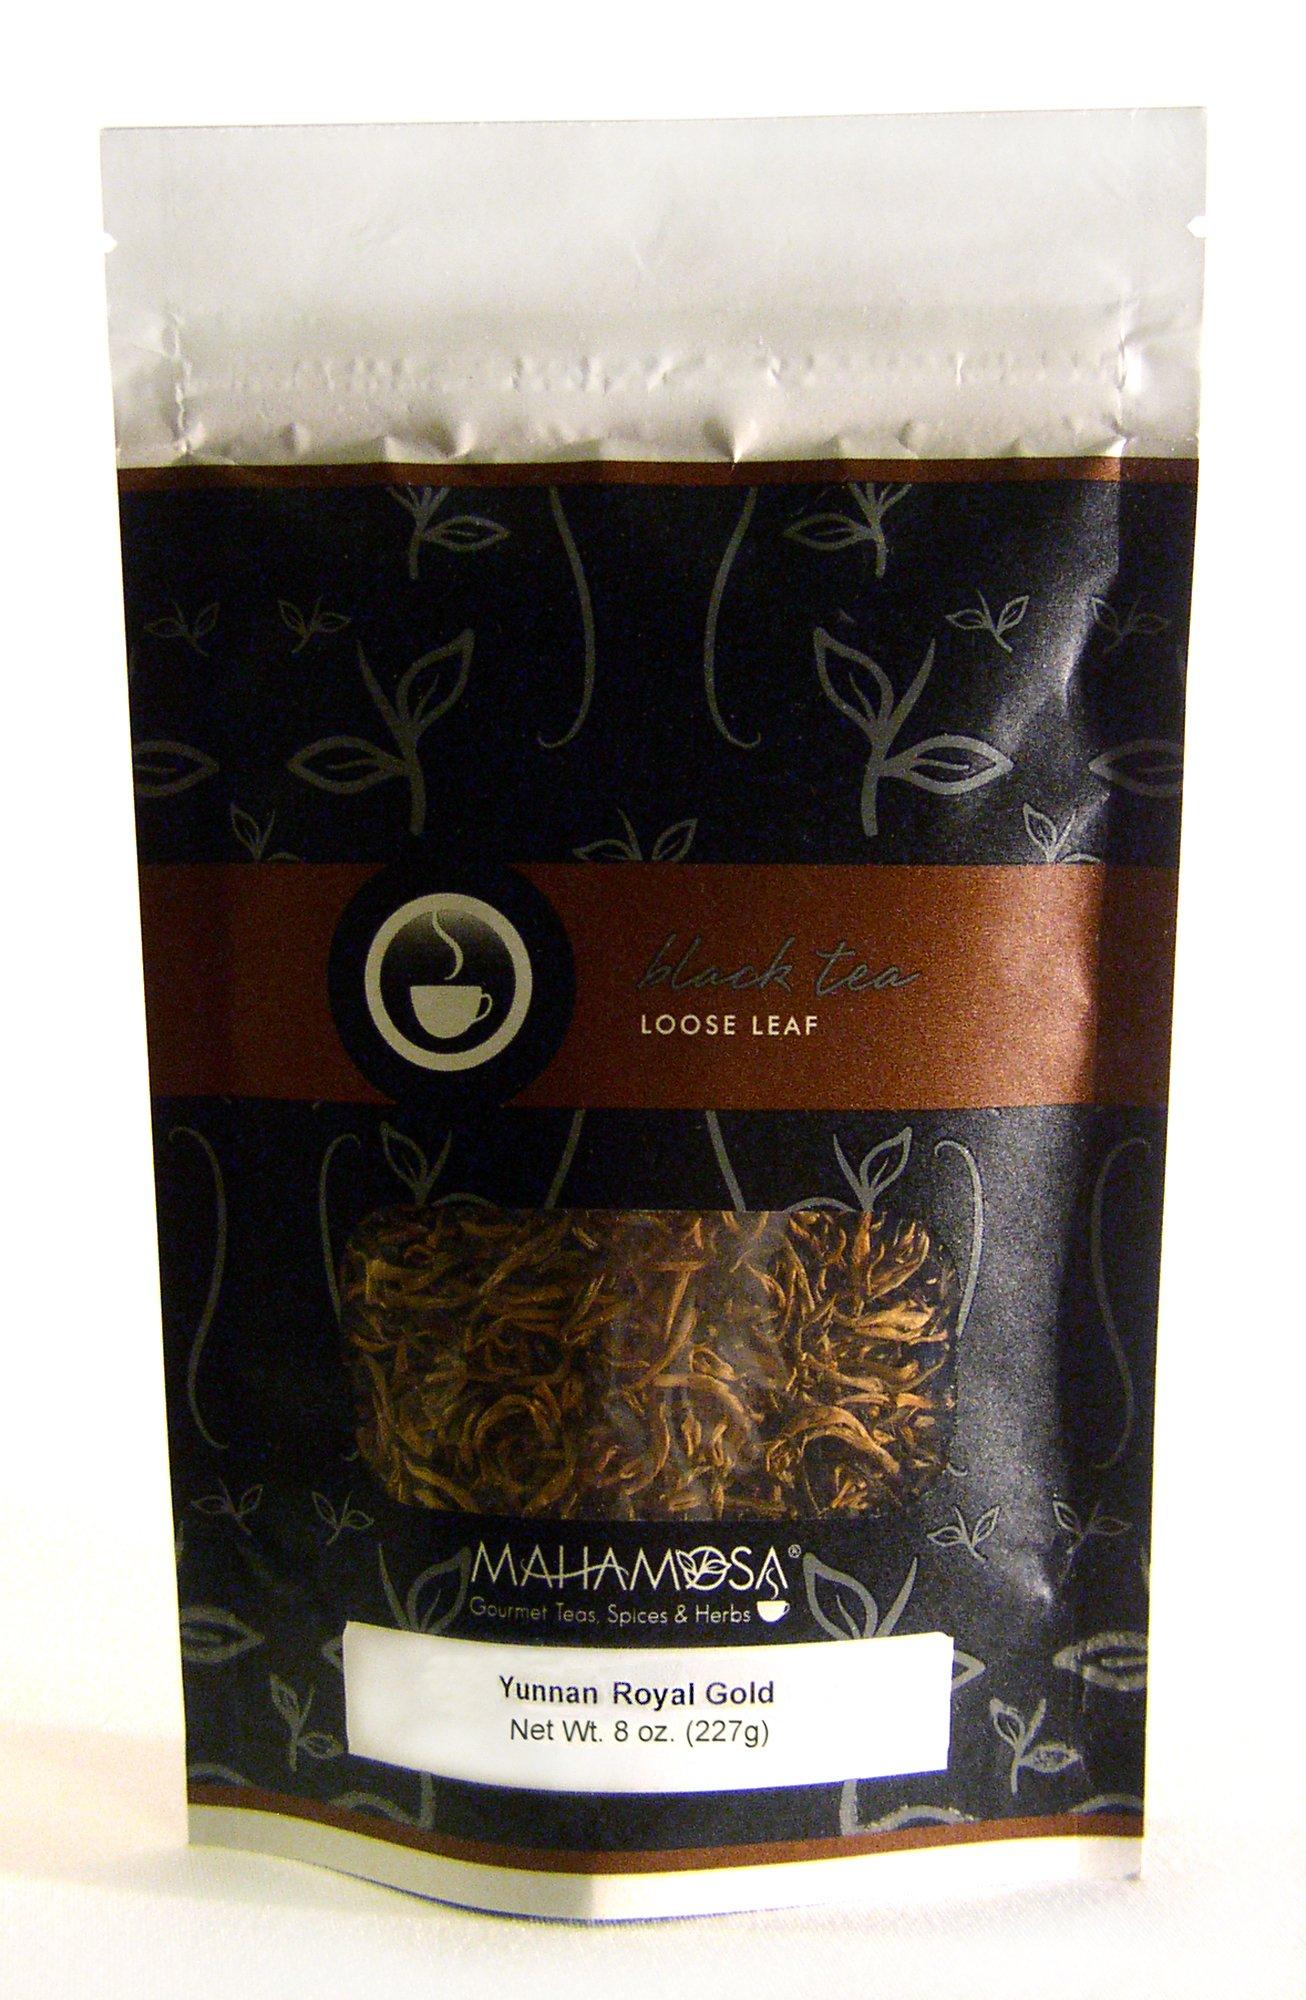 Mahamosa China Black Tea and Tea Infuser Set: 8 oz Yunnan Royal Gold Black Tea, 1 Stainless Steel Tea Ball Infuser (Bundle- 2 items)(Tea Ingredients: Chinese black tea)